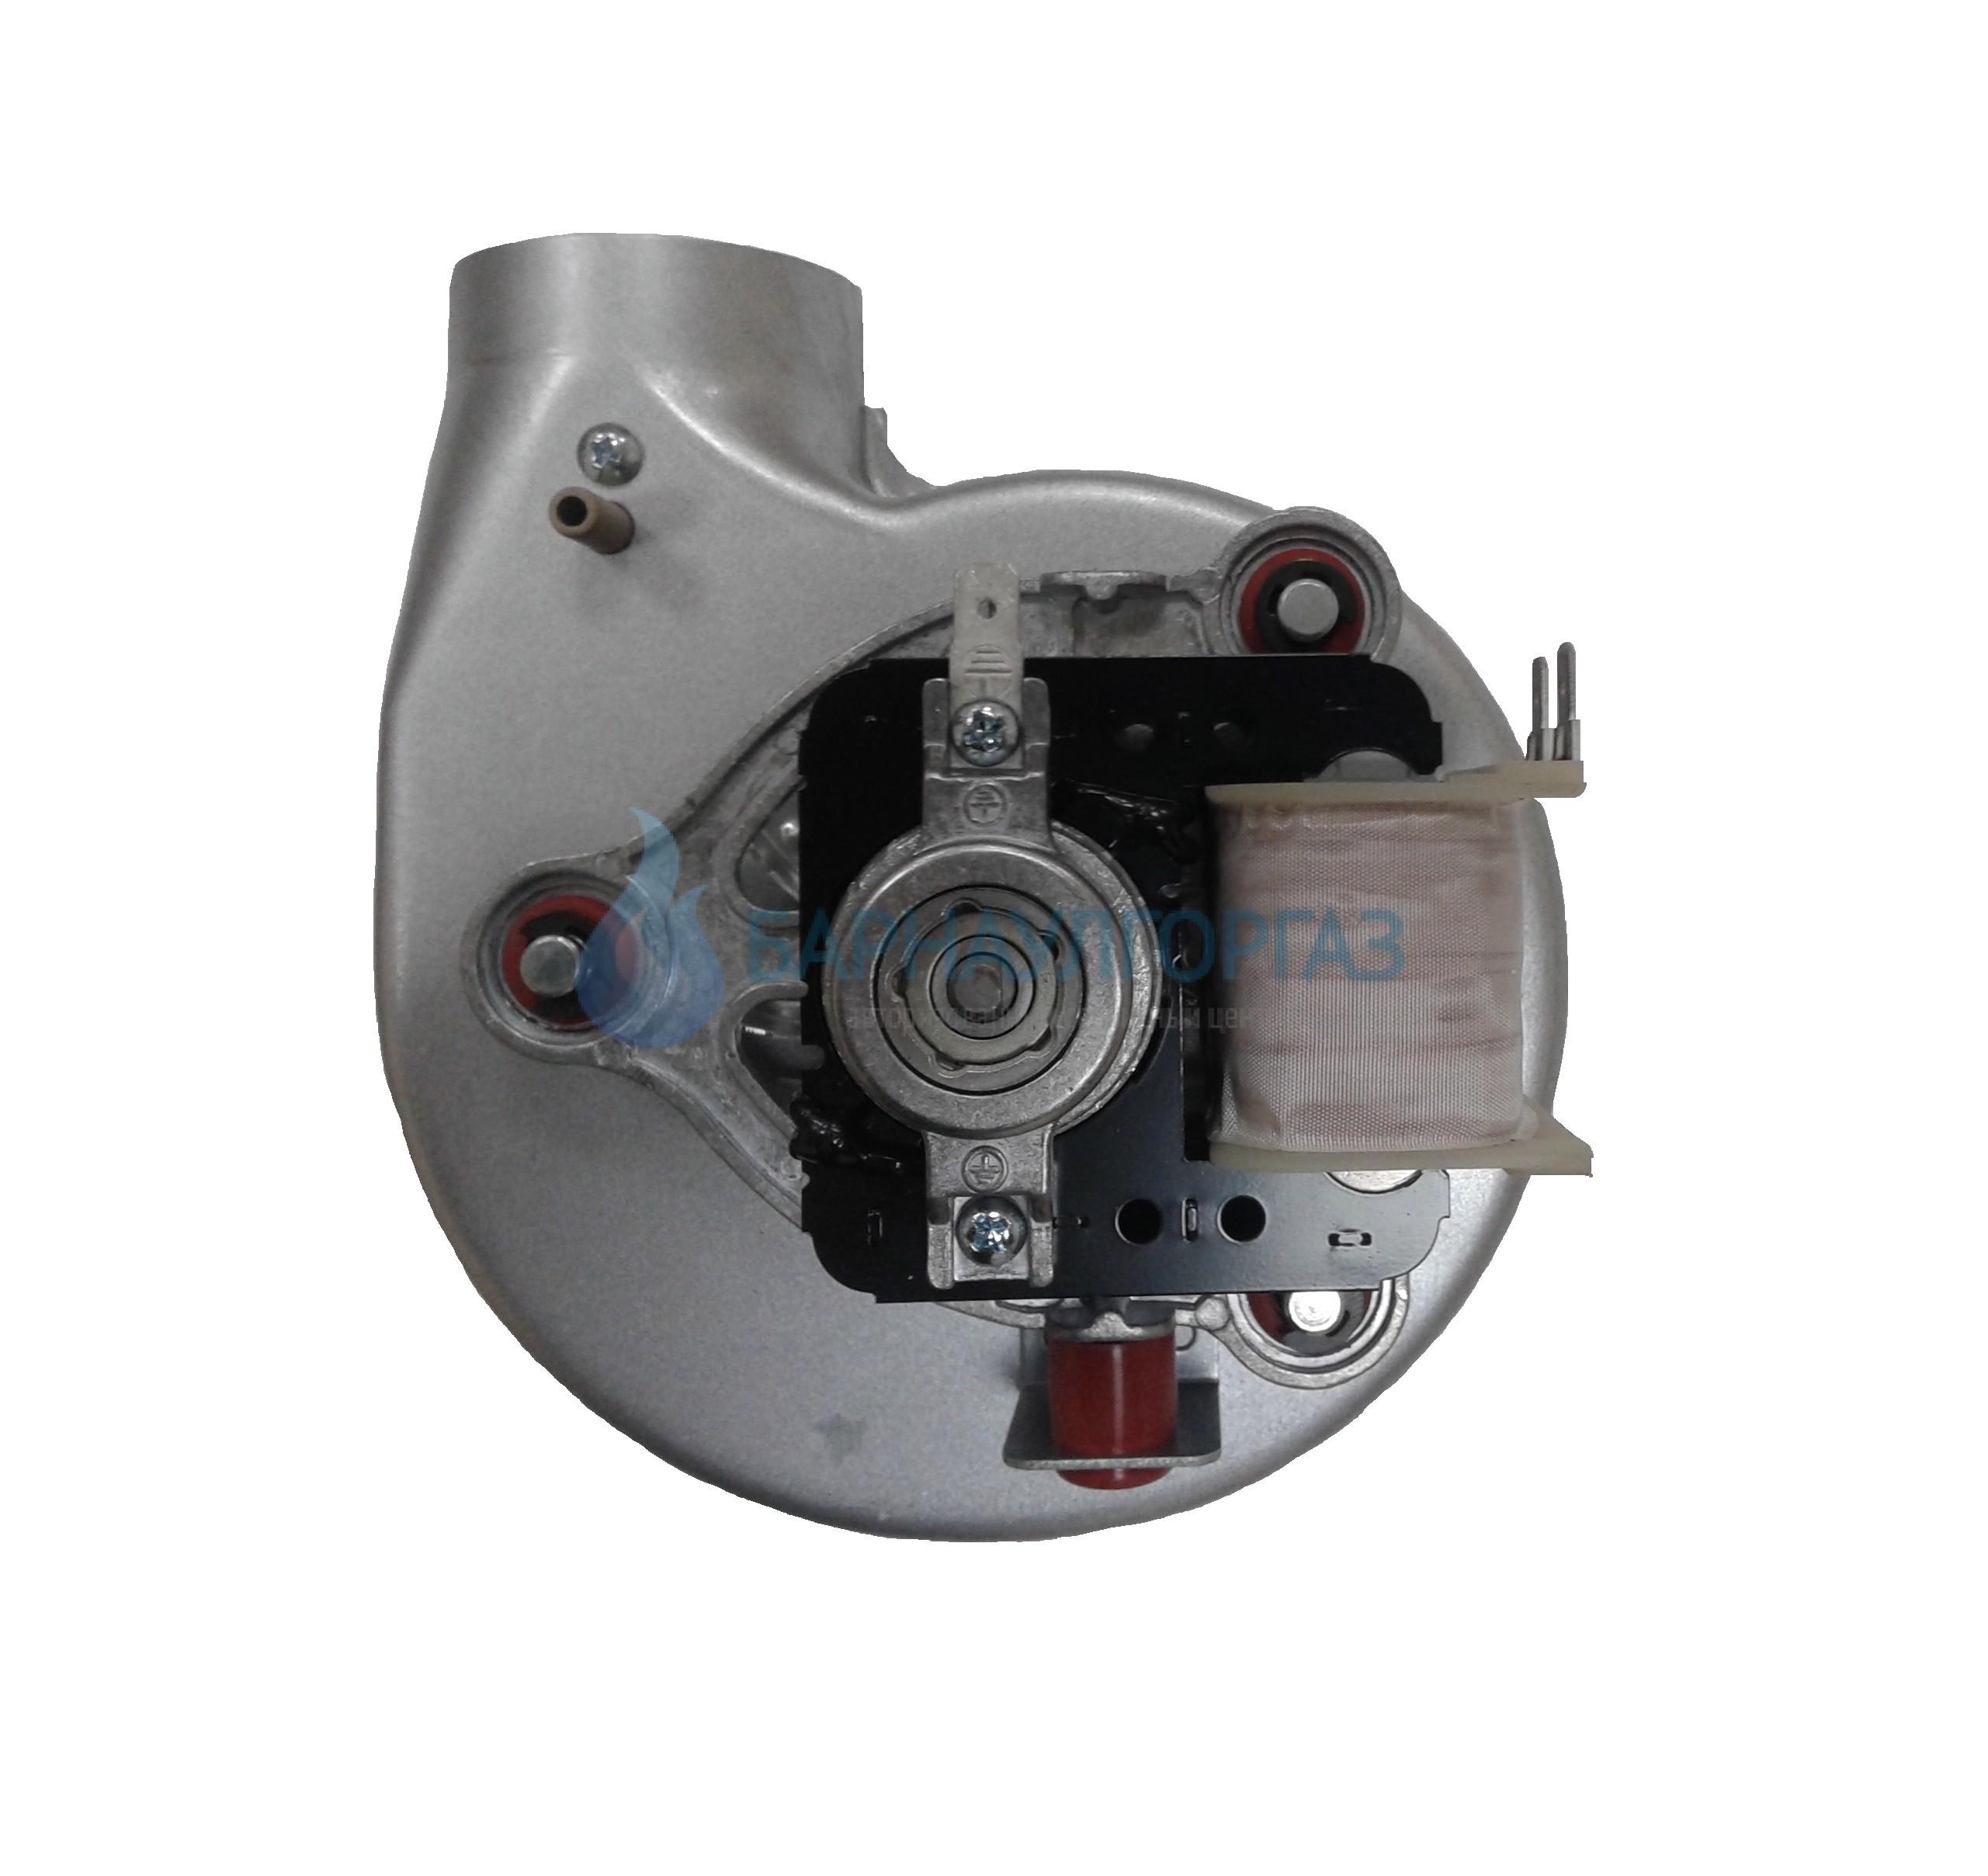 Вентилятор дымоудаления Koreastar (KS90264150)